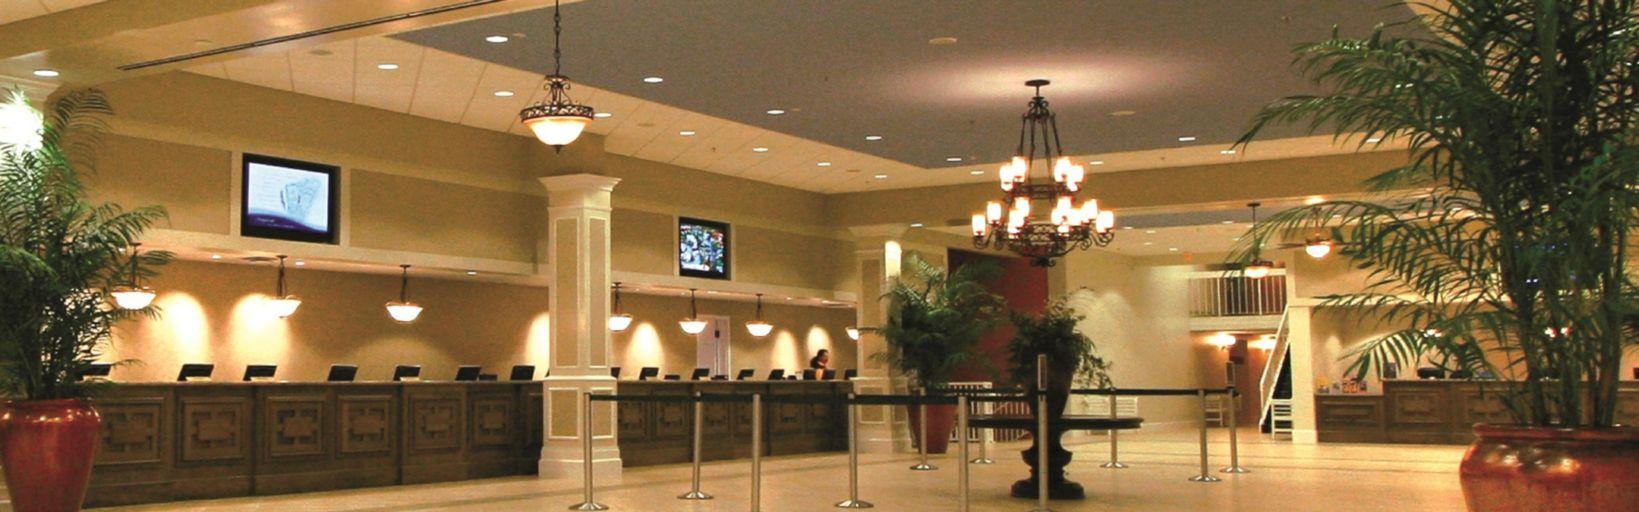 Holiday Inn Club Vacations Orlando - Orange Lake Resort Hotel by IHG